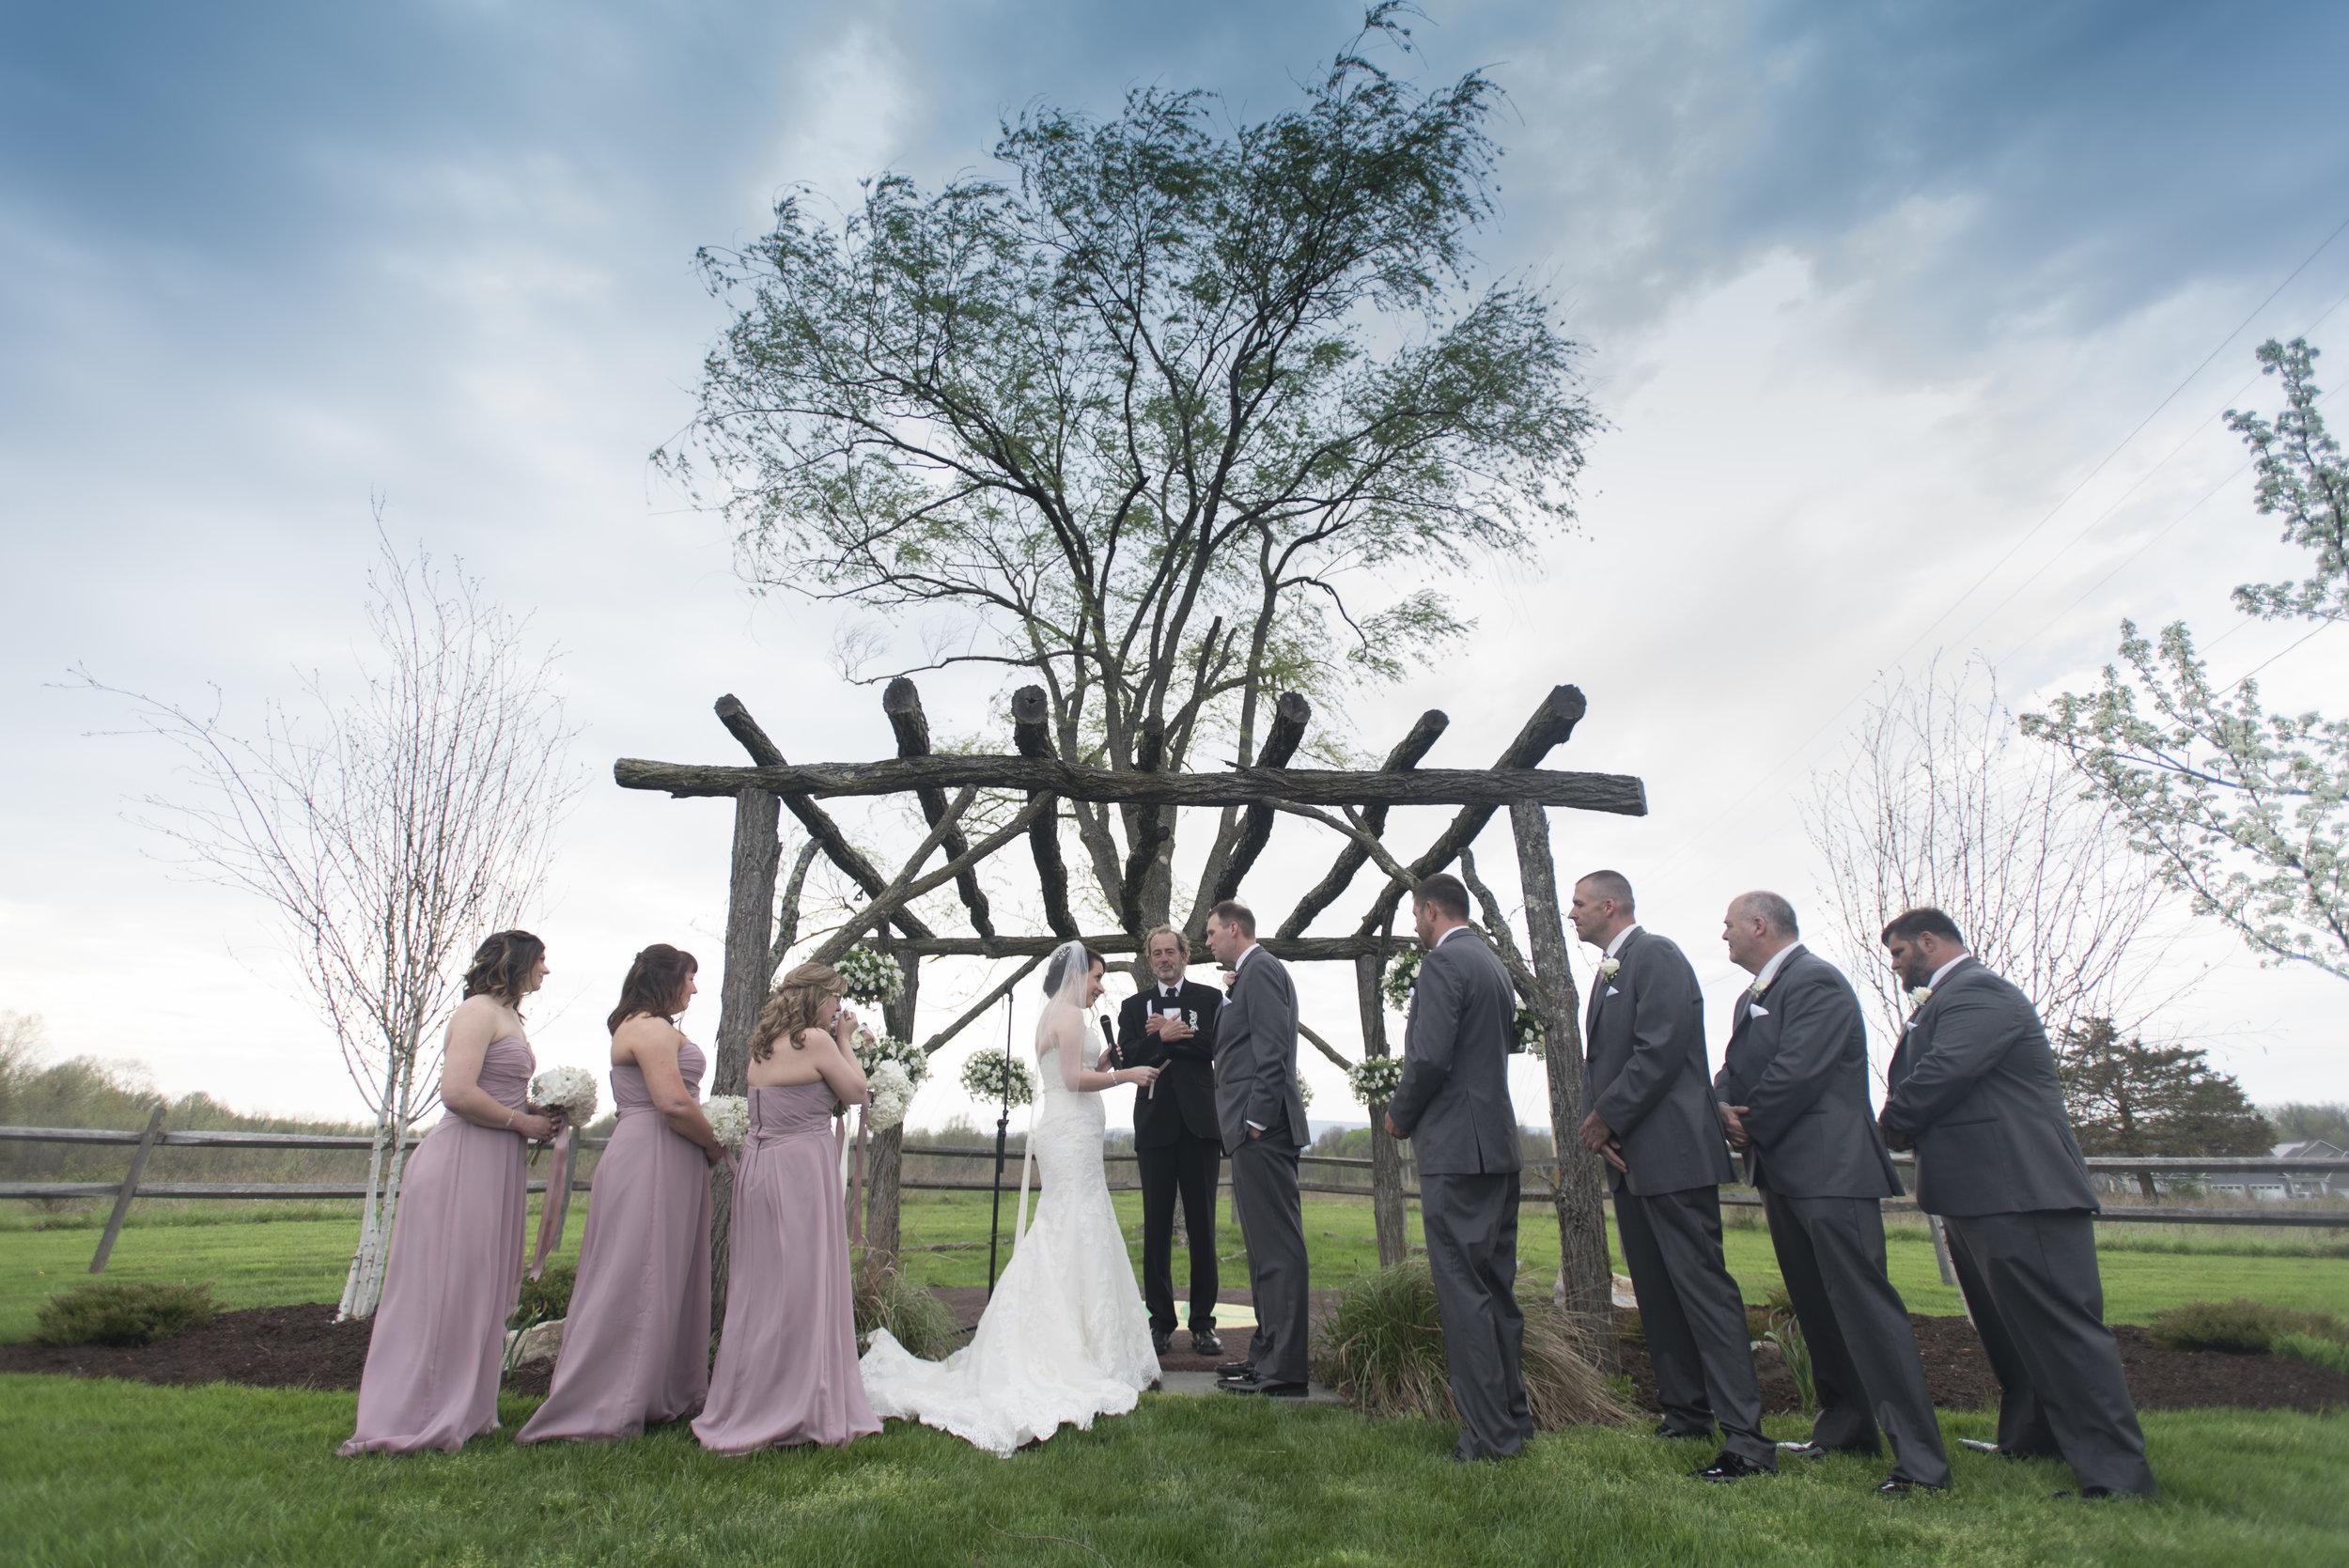 Lippincott manor weddings, wallkill ny wedding, photography, photos a.jpg